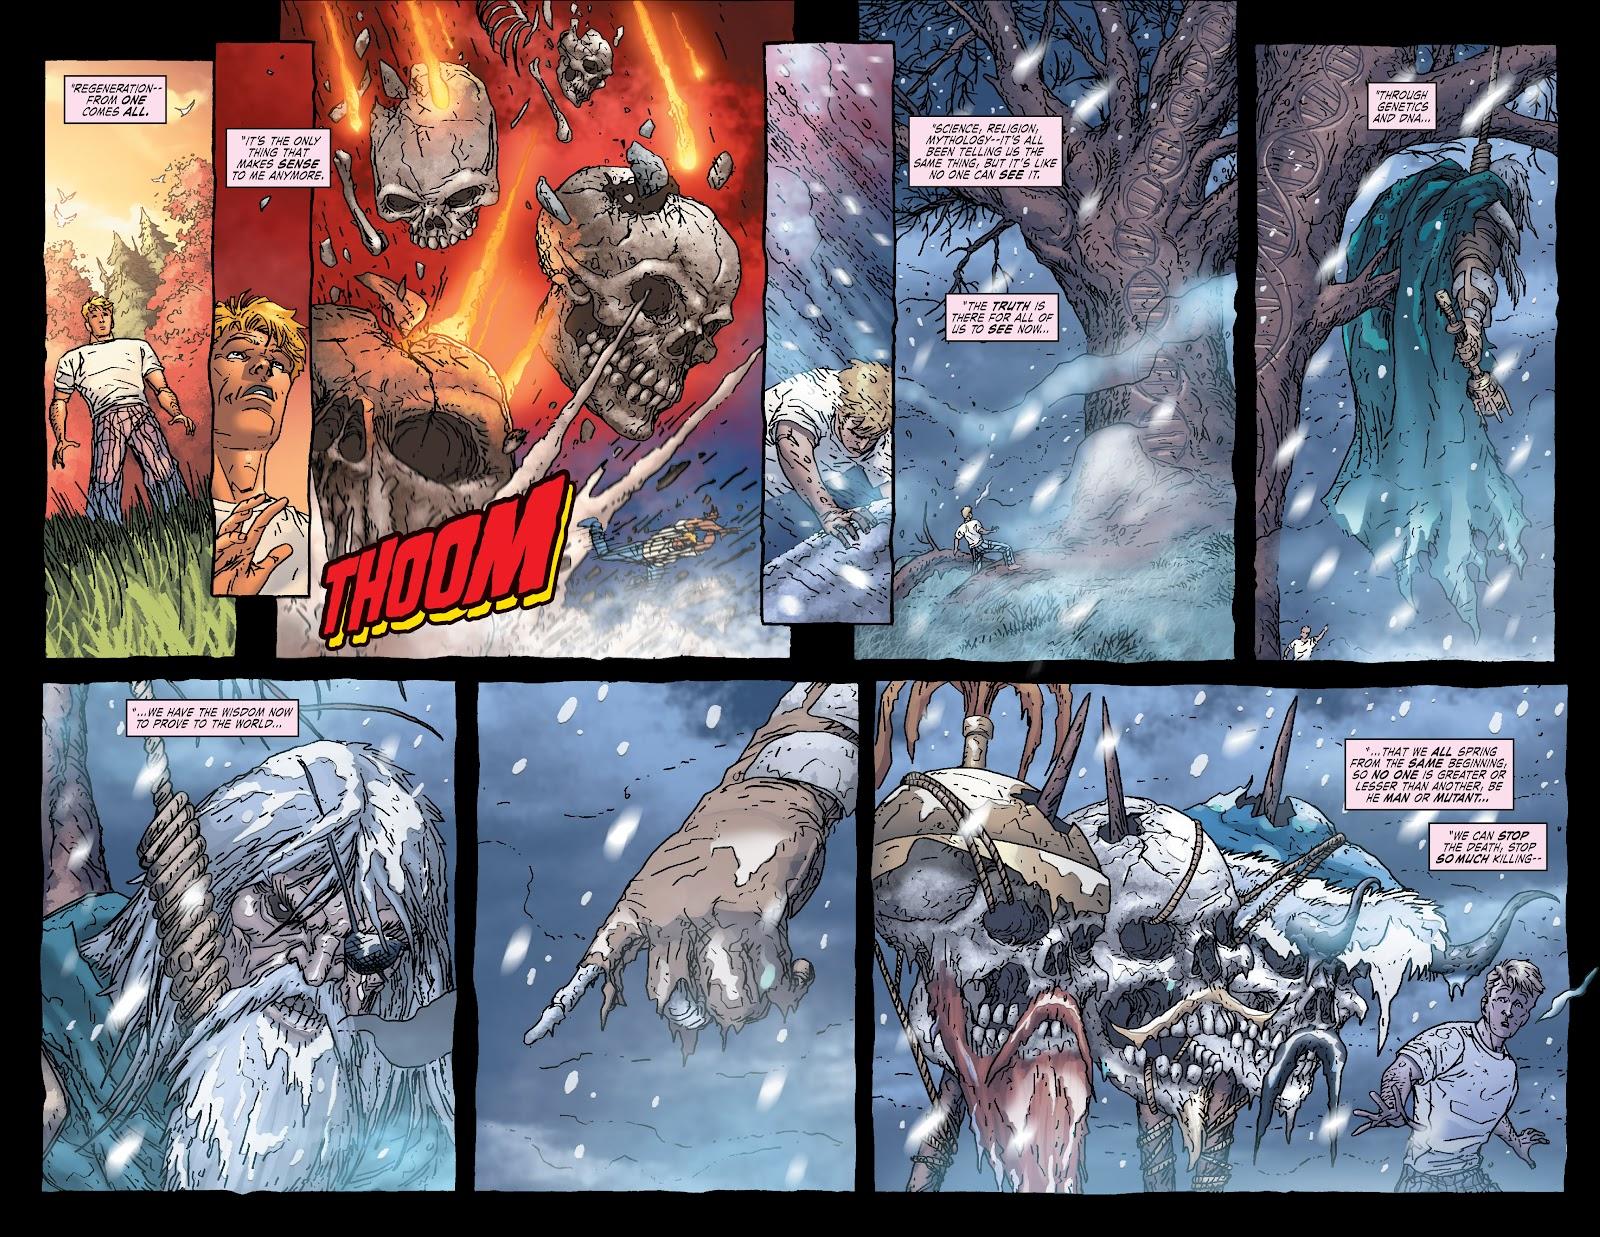 Read online Thor: Ragnaroks comic -  Issue # TPB (Part 1) - 16